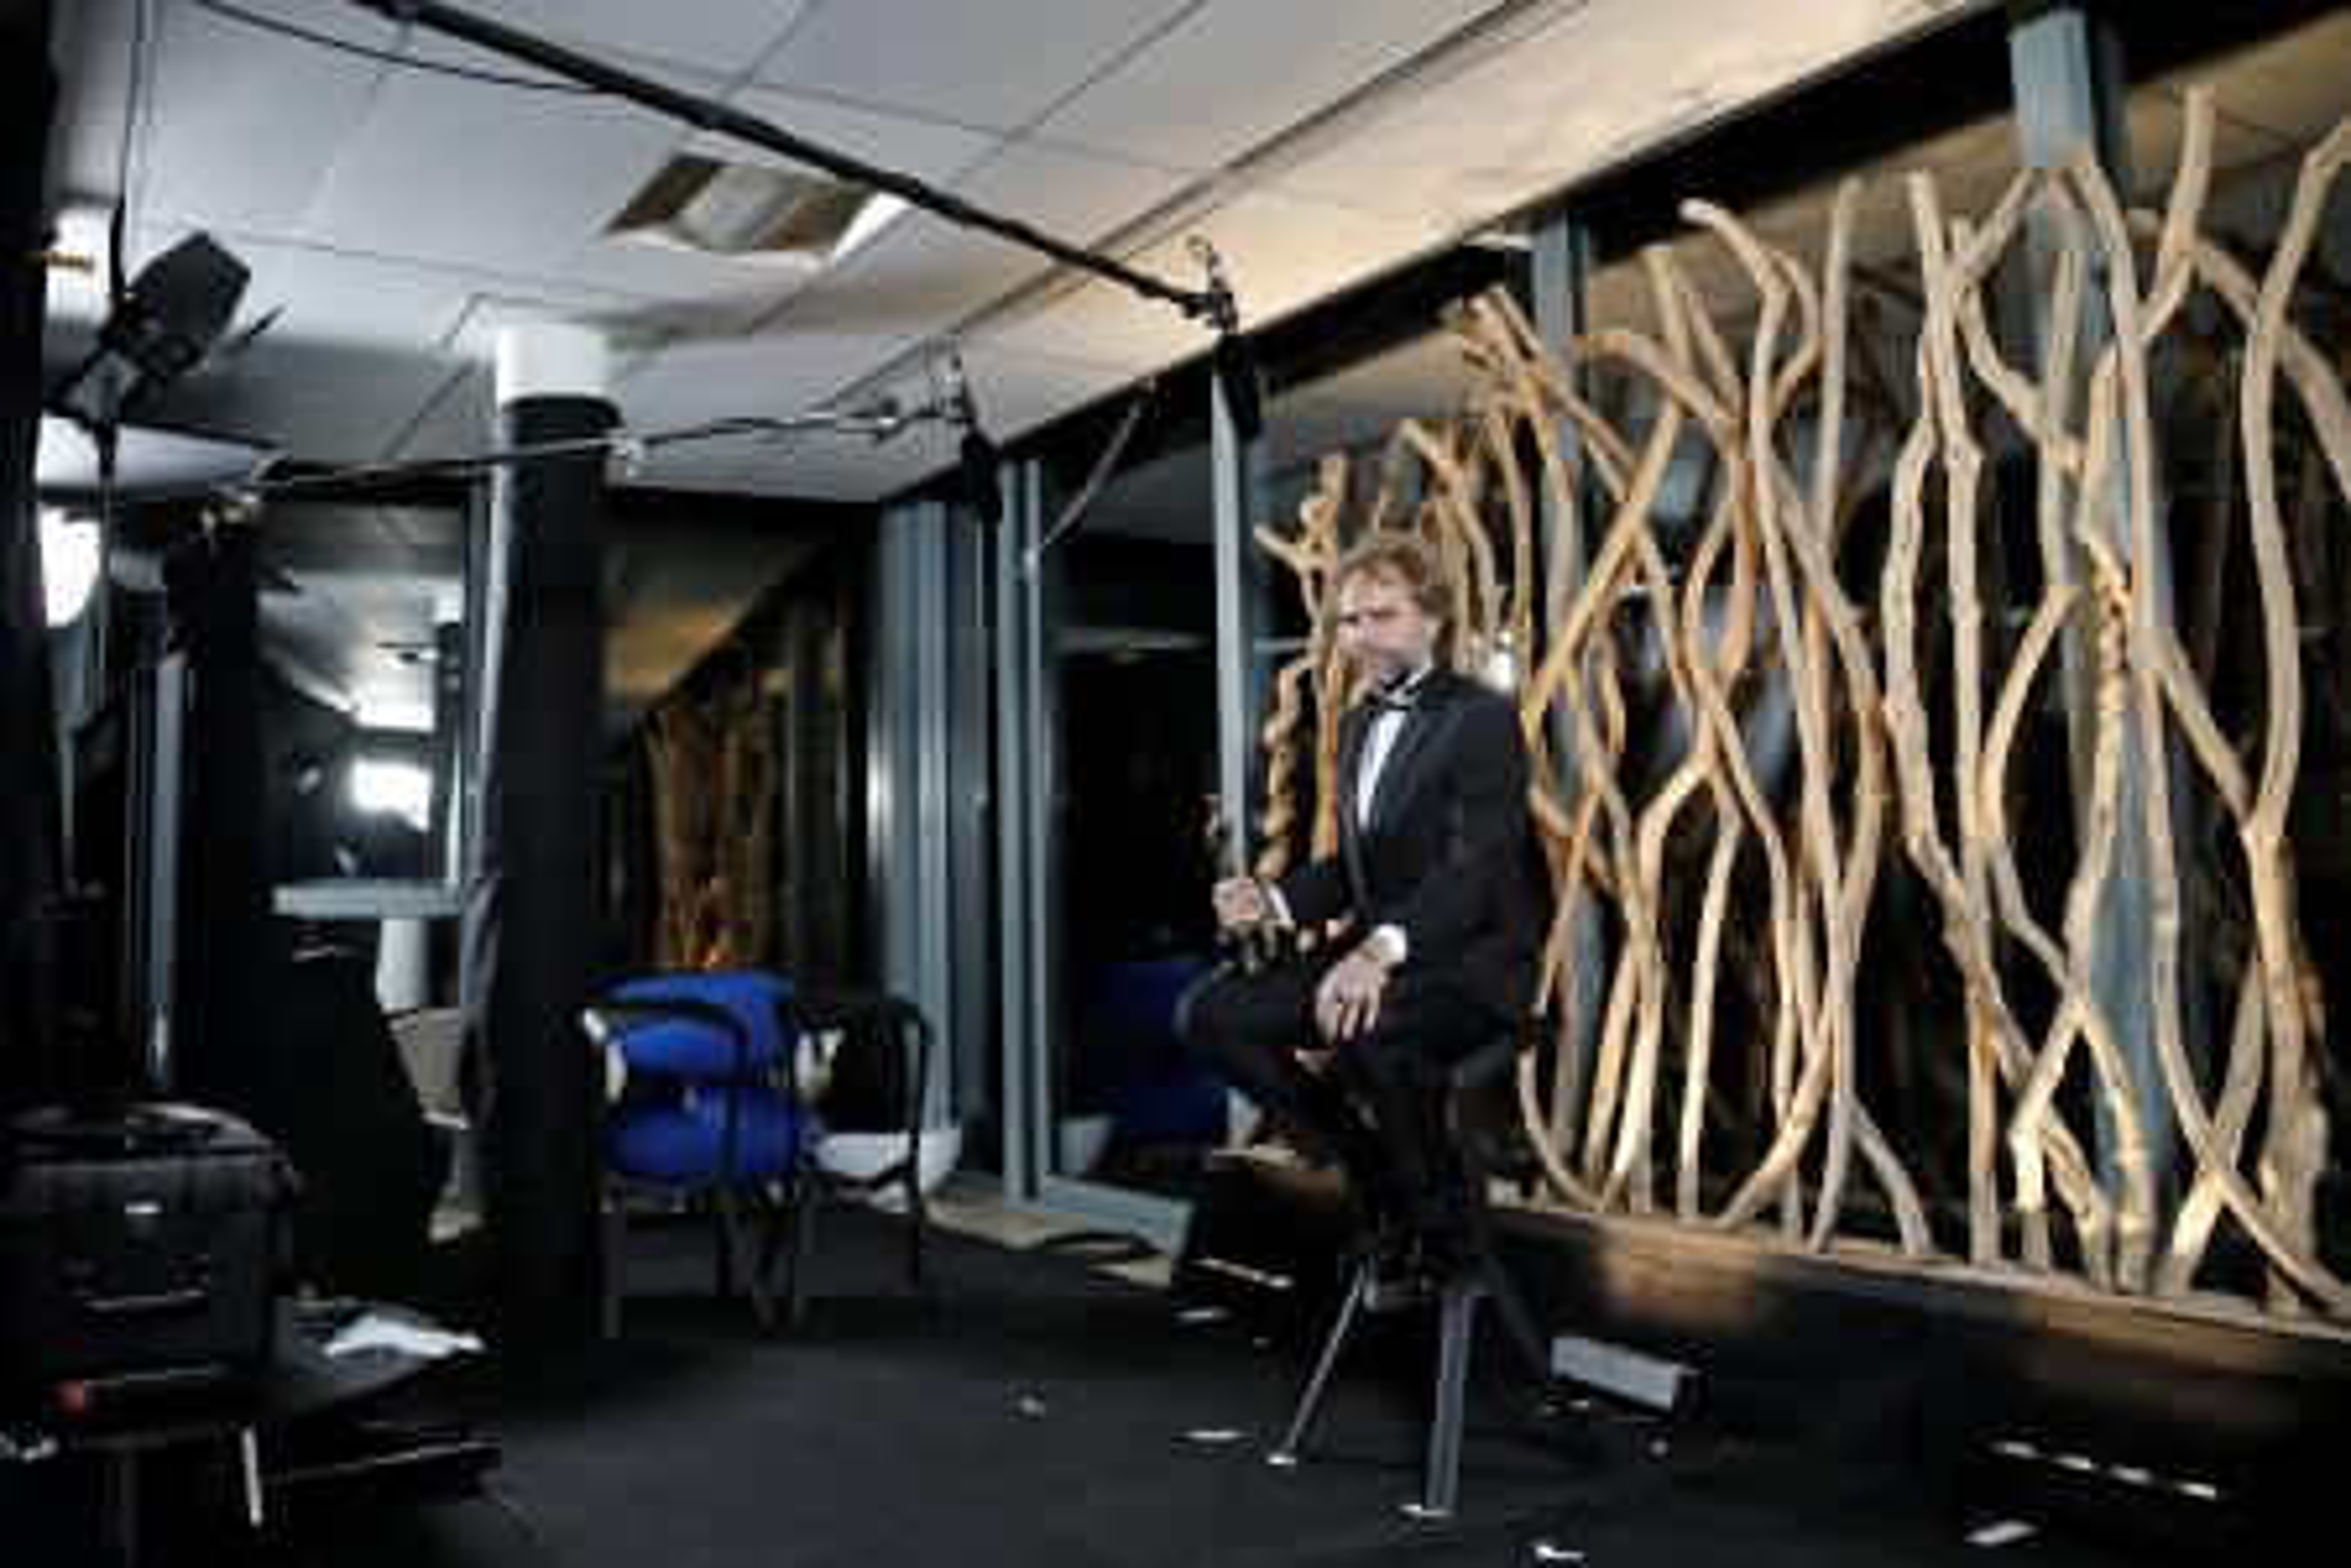 Florian Zeller's Oscars acceptance speech in London